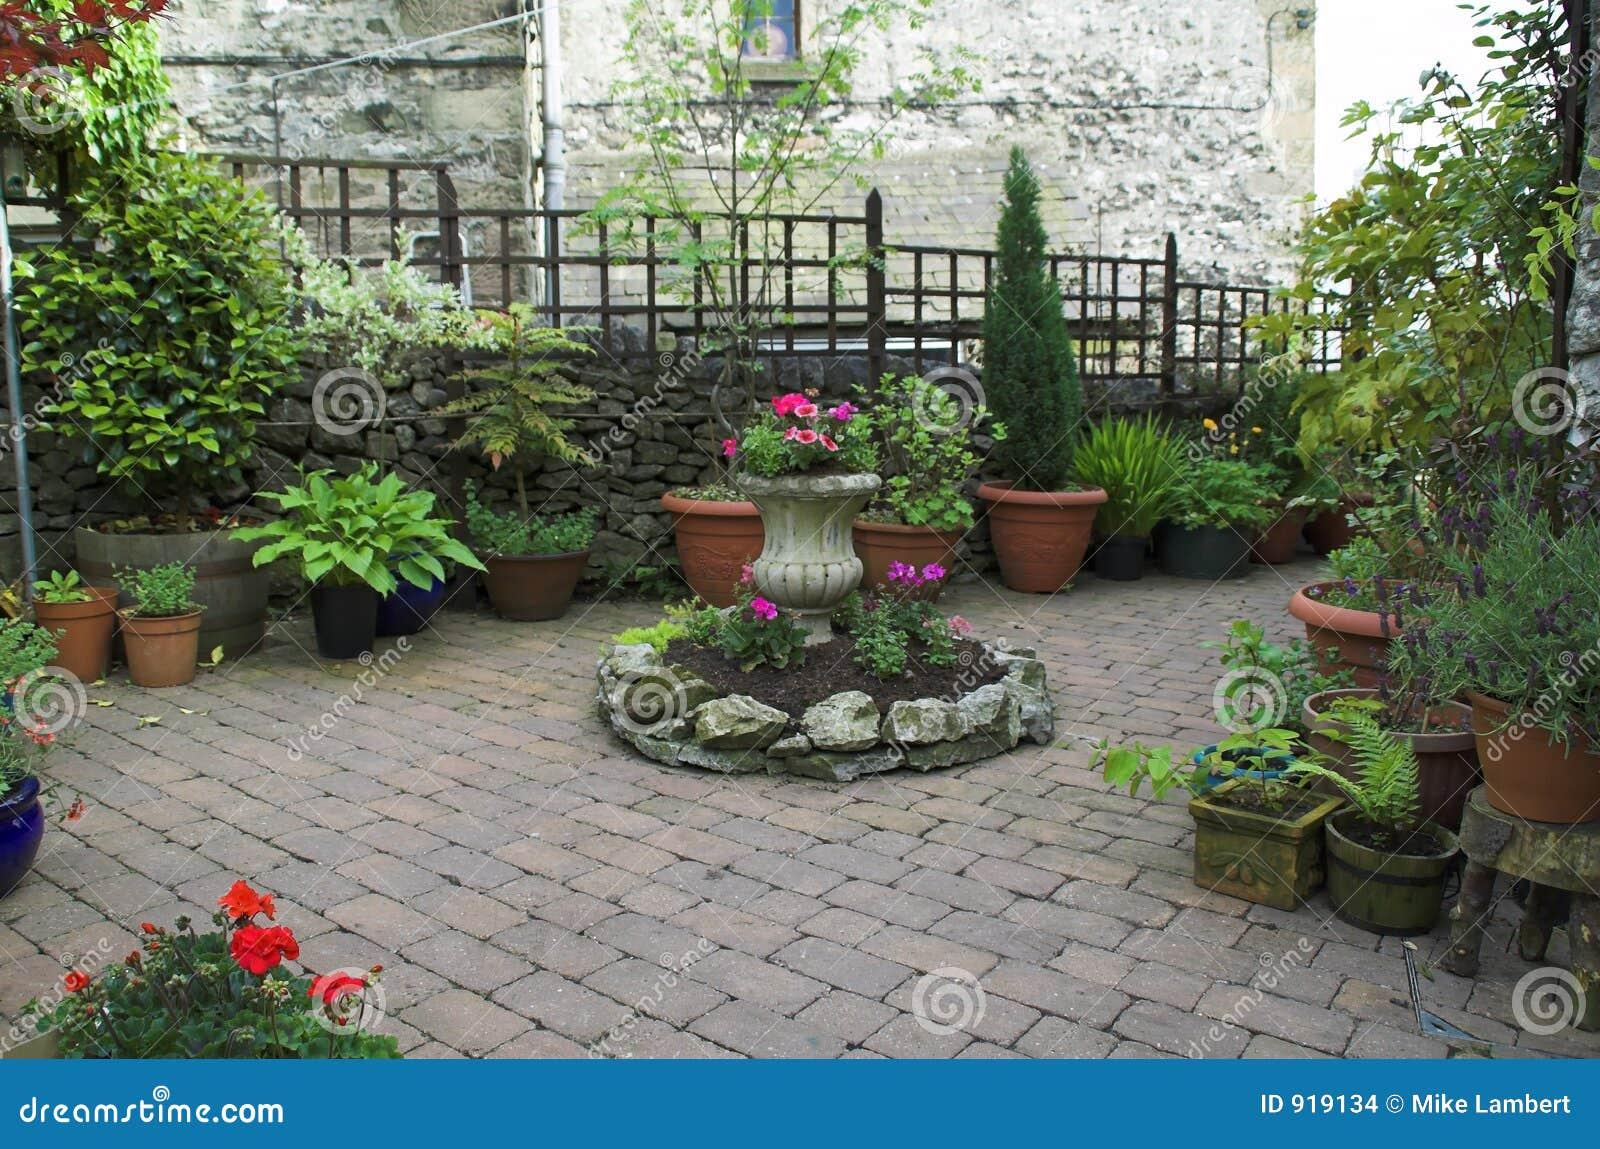 Jardin pav en cailloutis for Bricoler dans le jardin